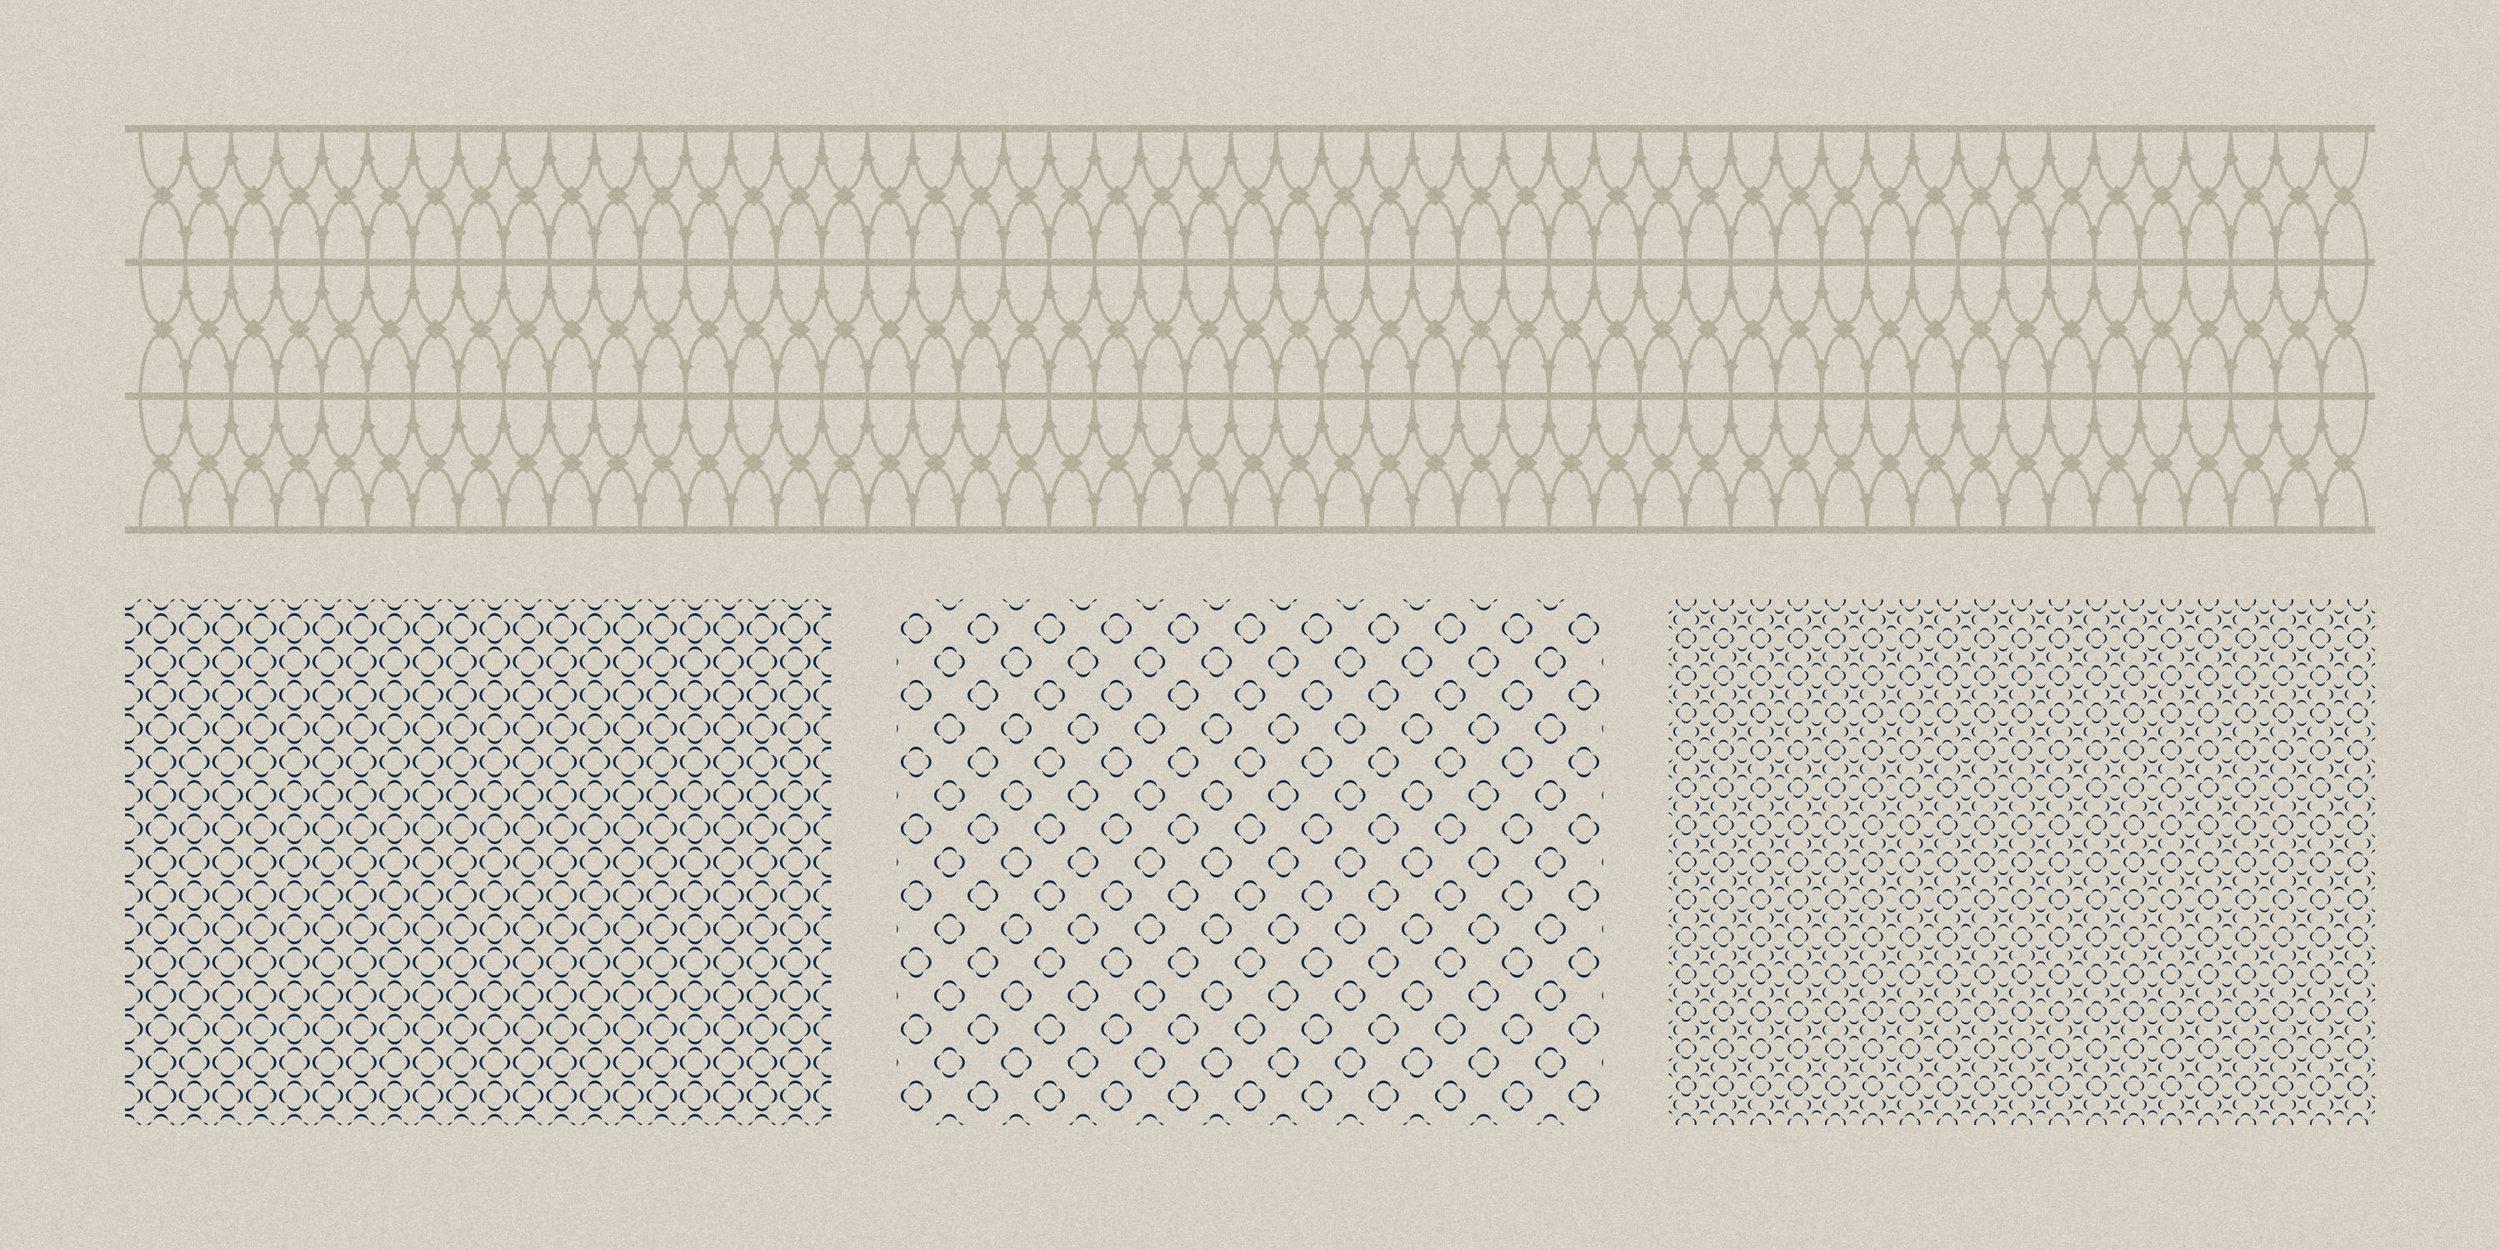 ronaldvillegas-the-crescent-dallas-identity-pattern.jpg